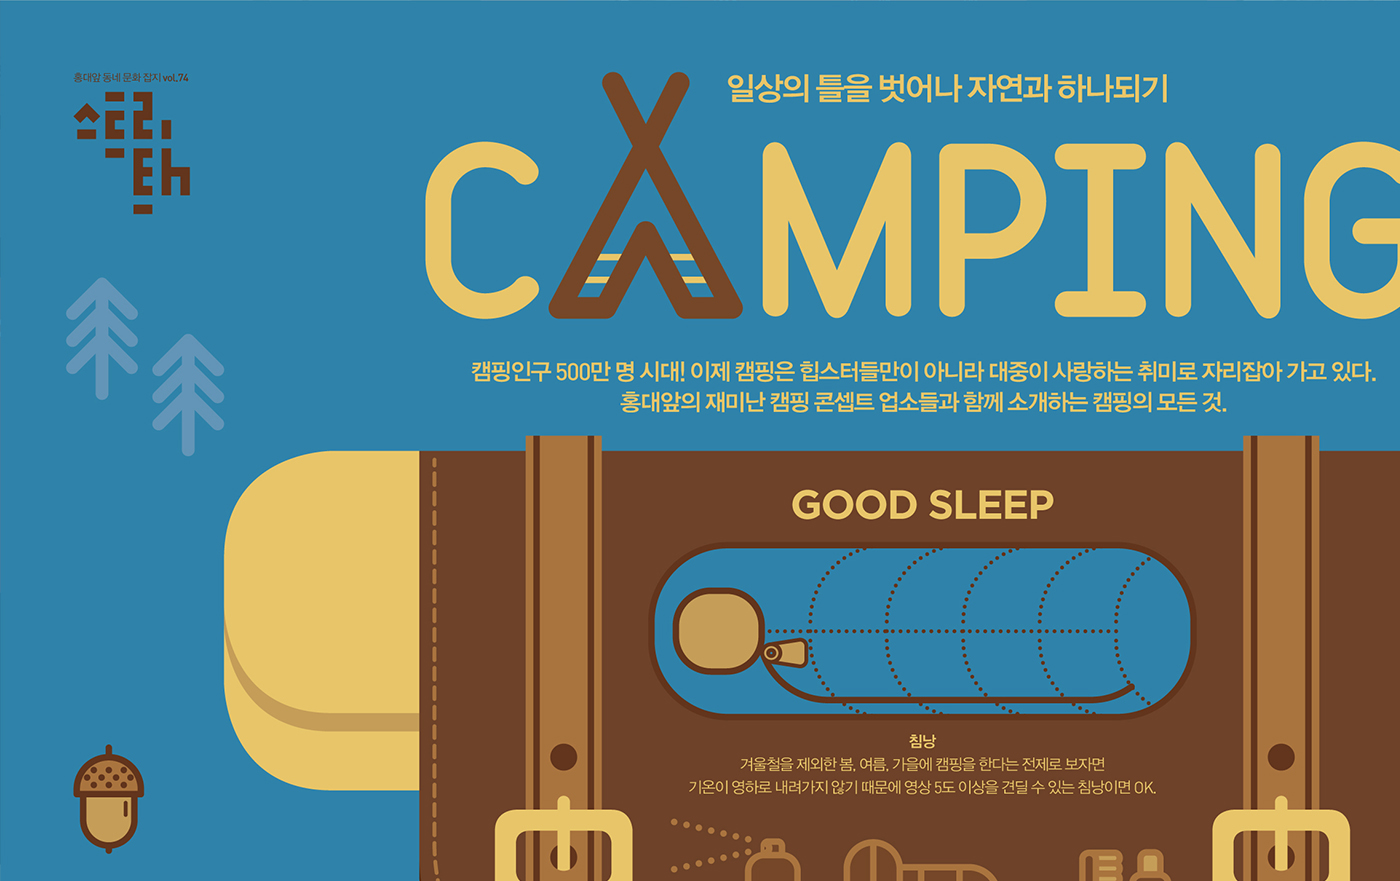 #Poster #Design #graphic design #infographic #infographics #data visualization #editorialdesign #nature #Camping   #203x